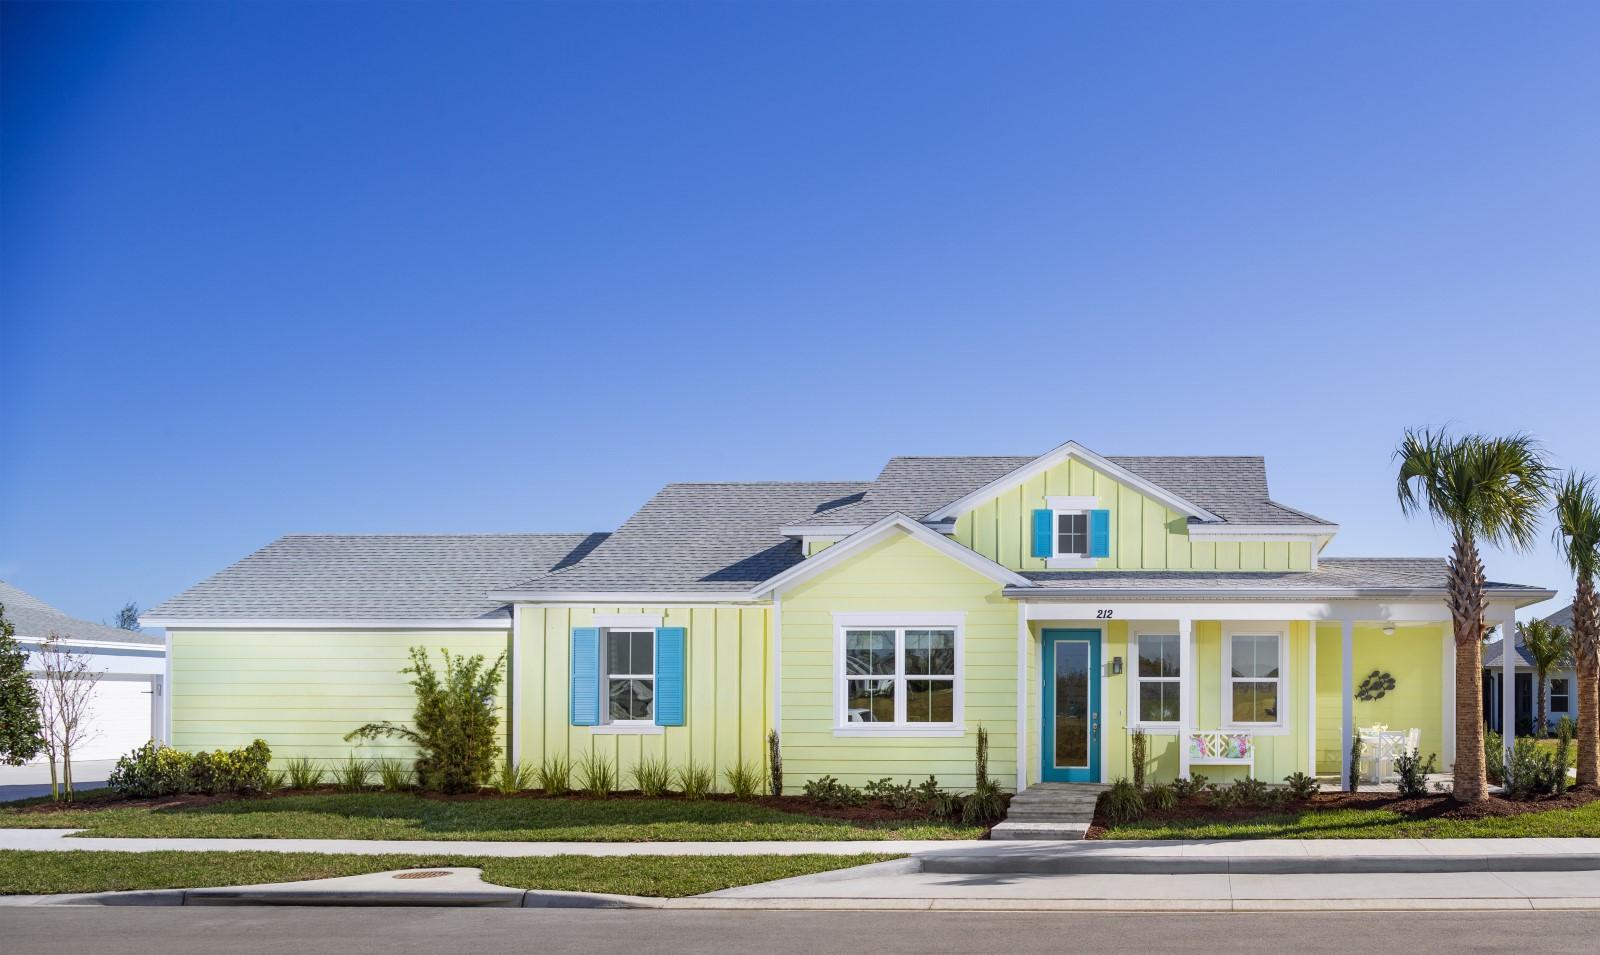 Latitude Margaritaville Daytona | Florida Coastal Living | 55+ | Active Adult